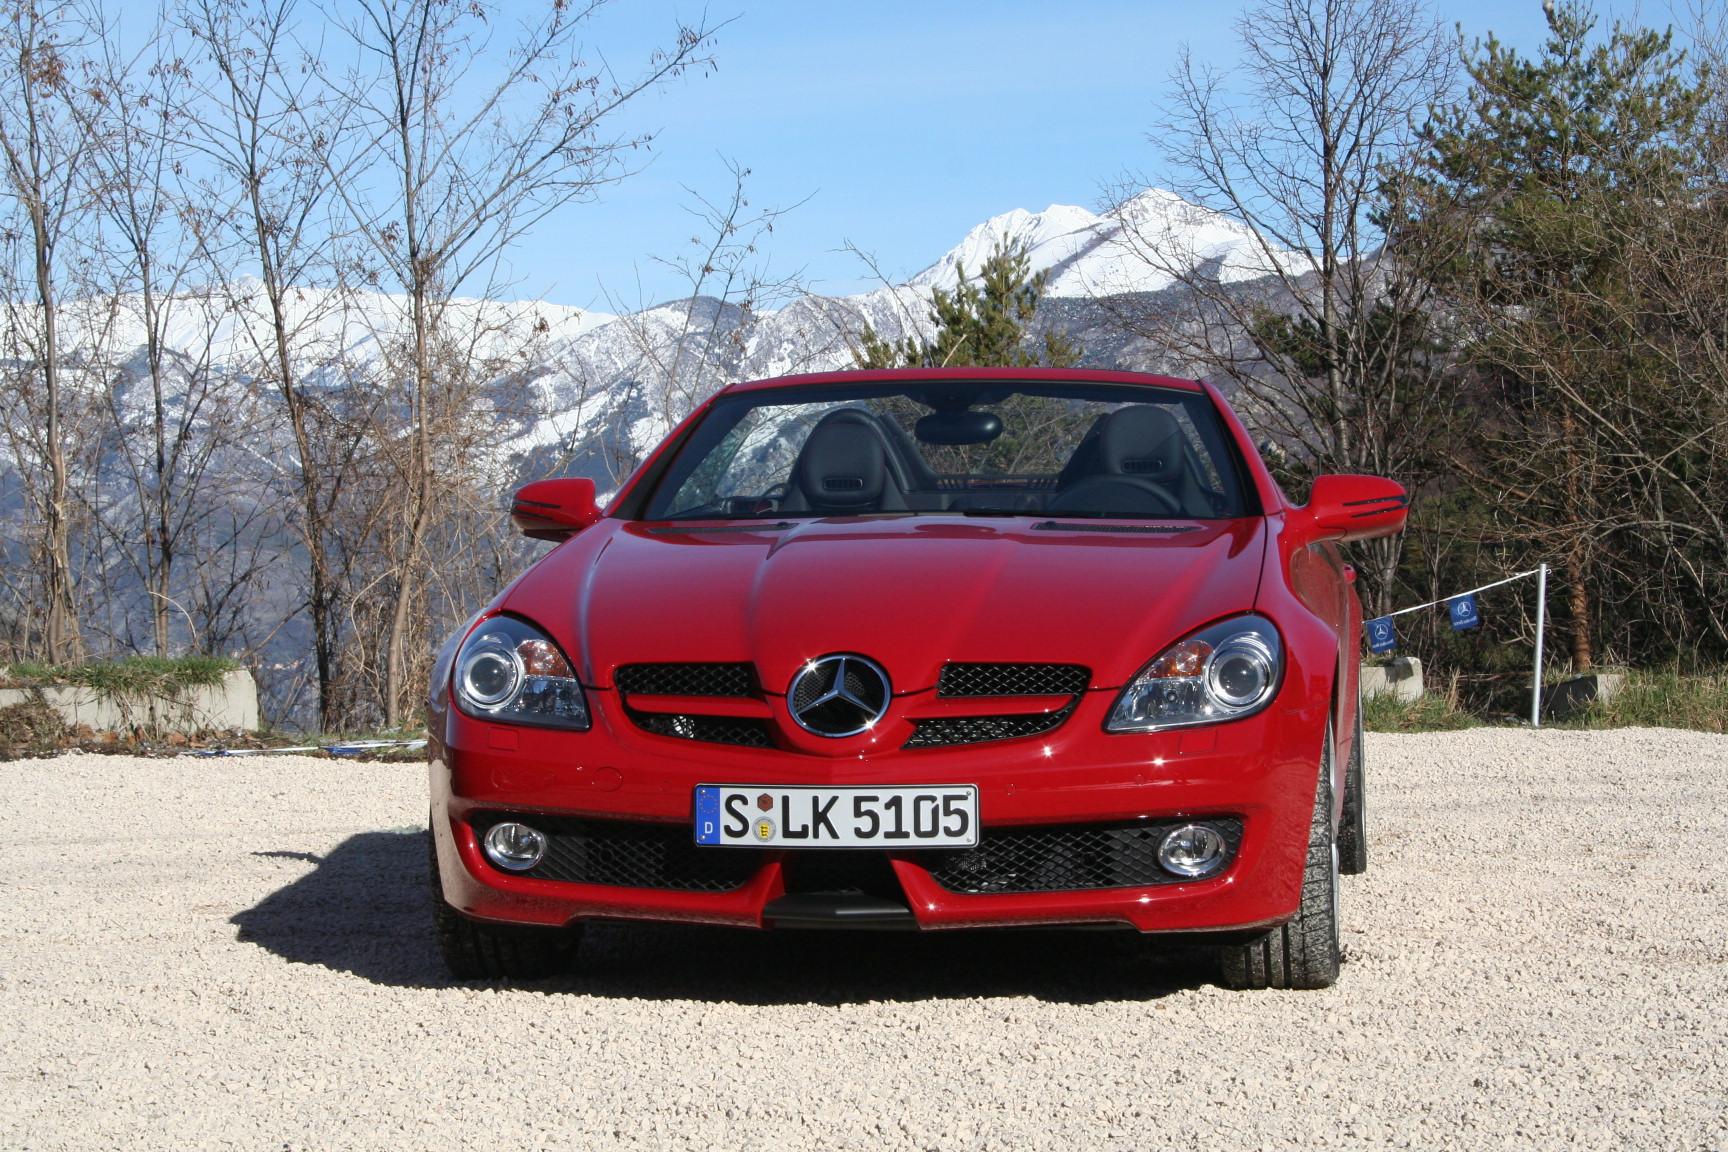 TÜV-Report 2015 - Sieger Mercedes SLK